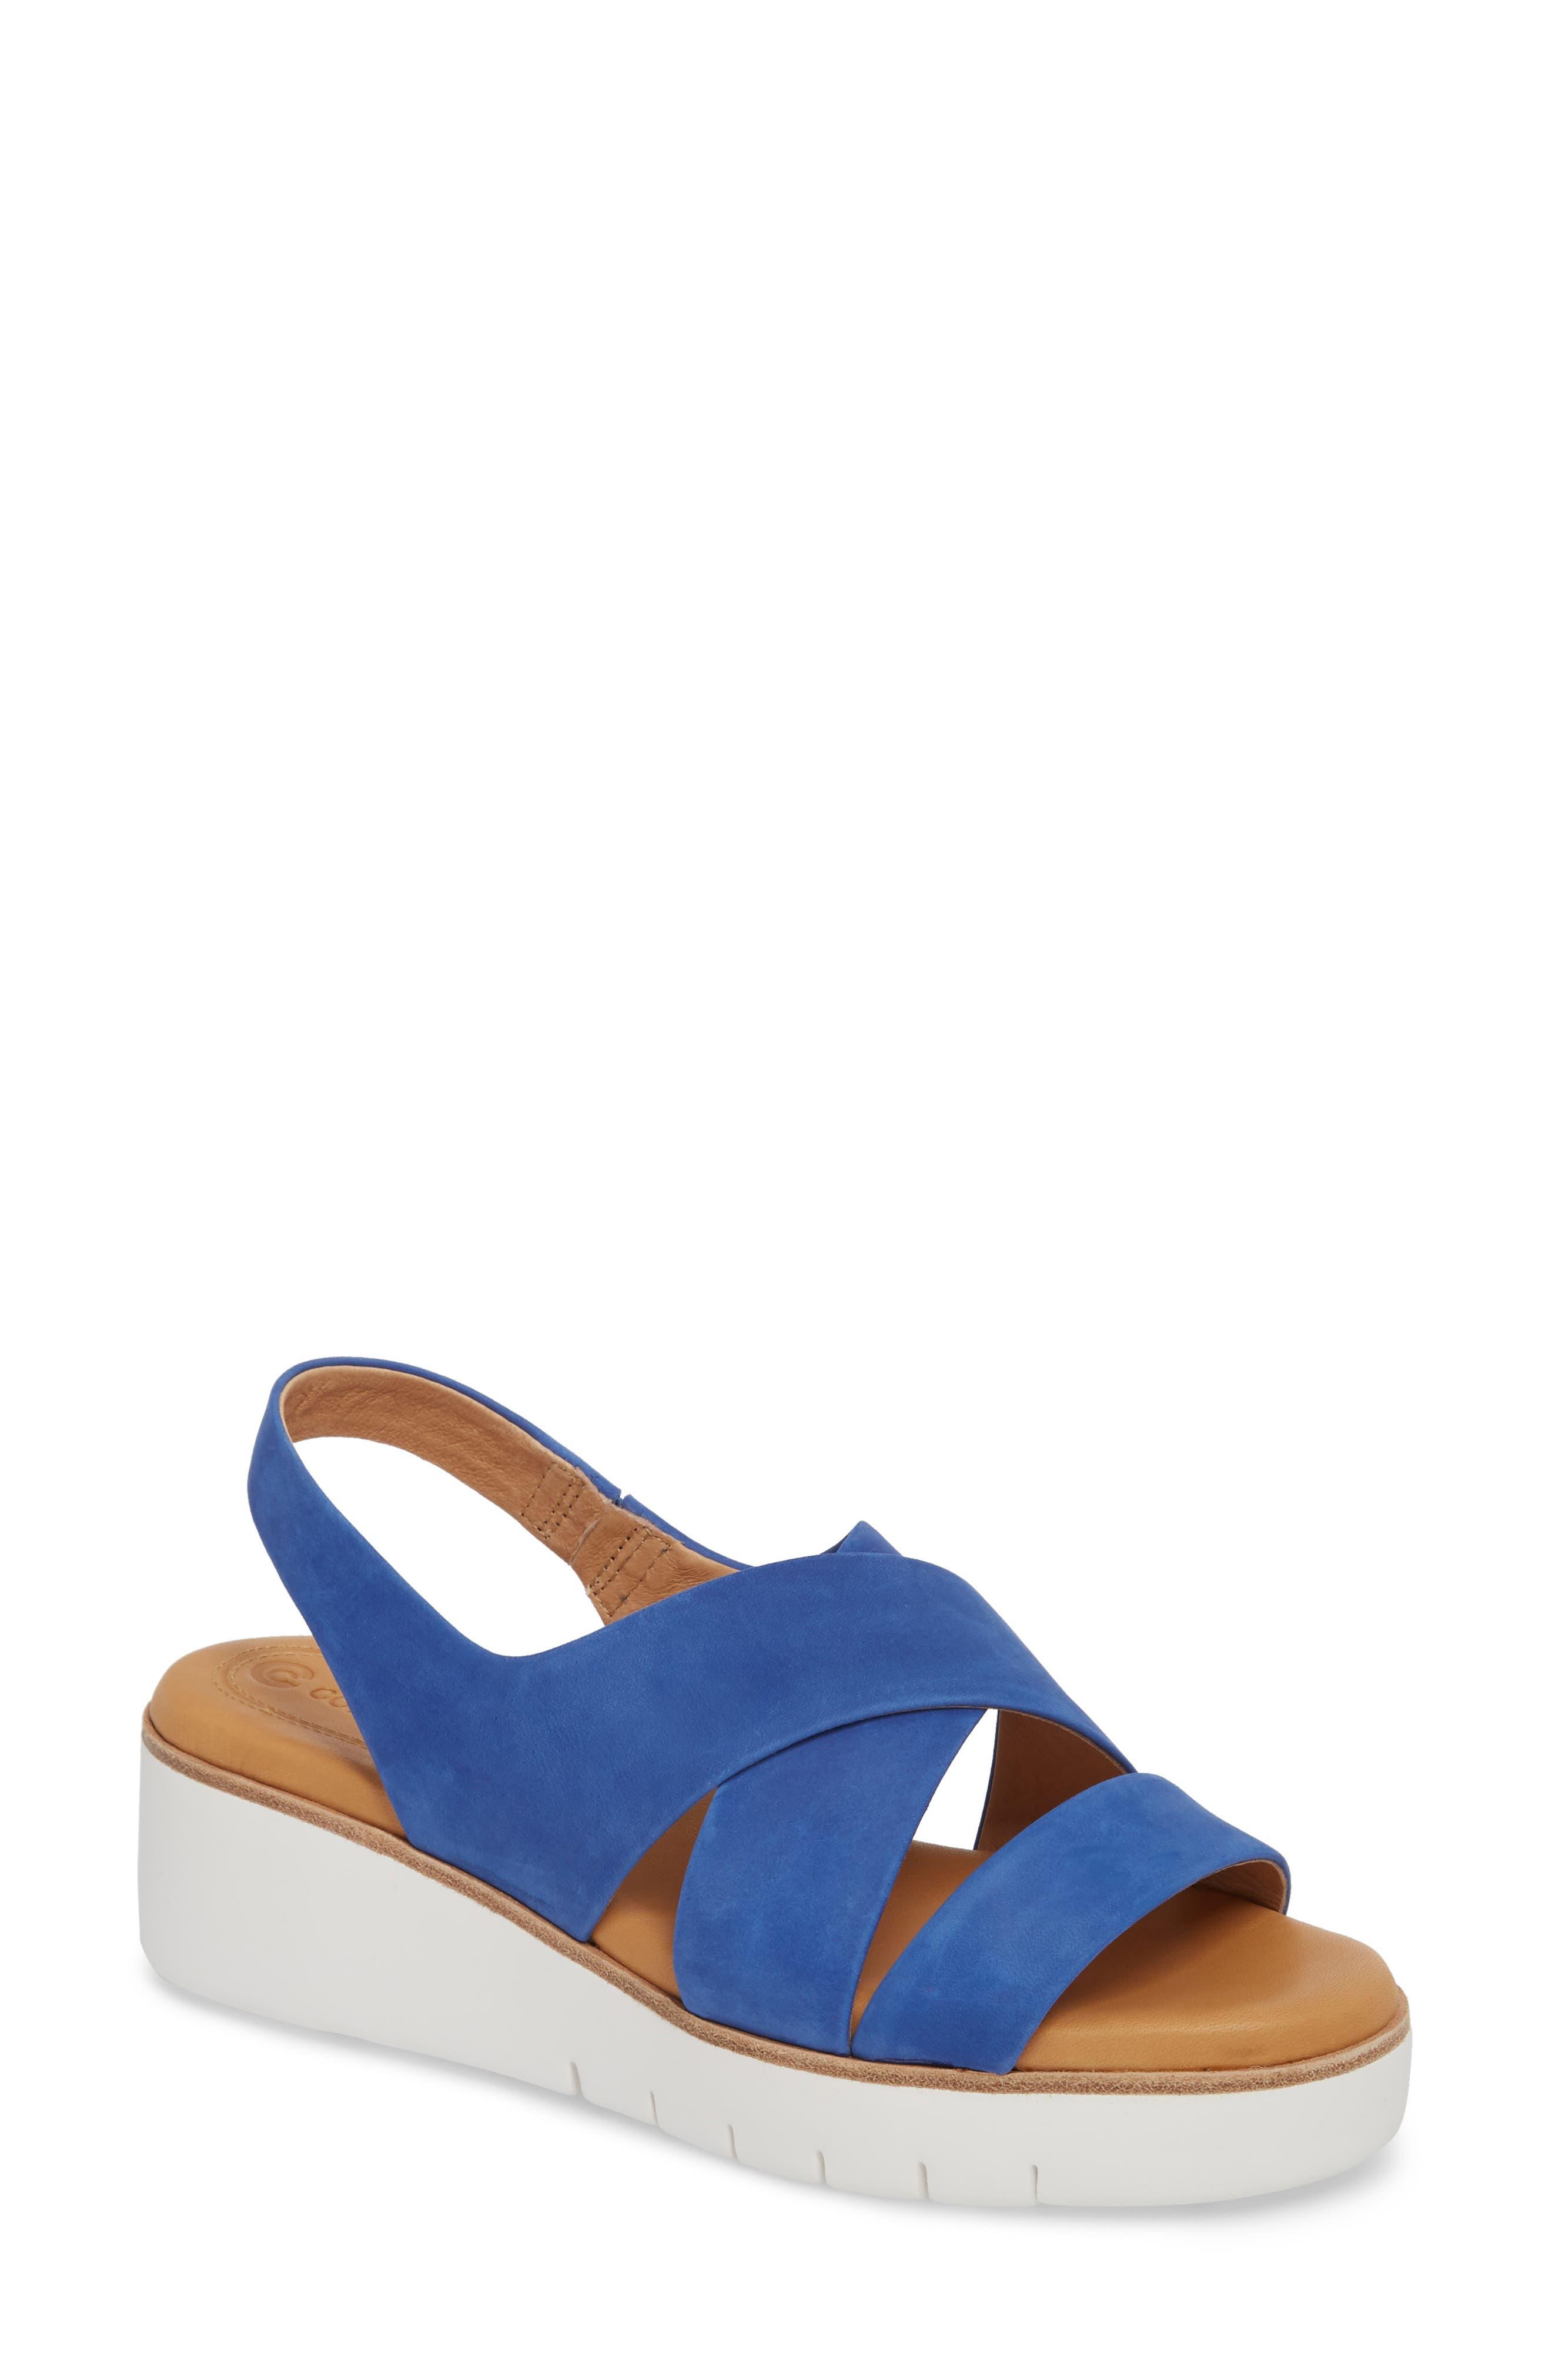 Cc Corso Como Brinney Wedge Sandal- Blue